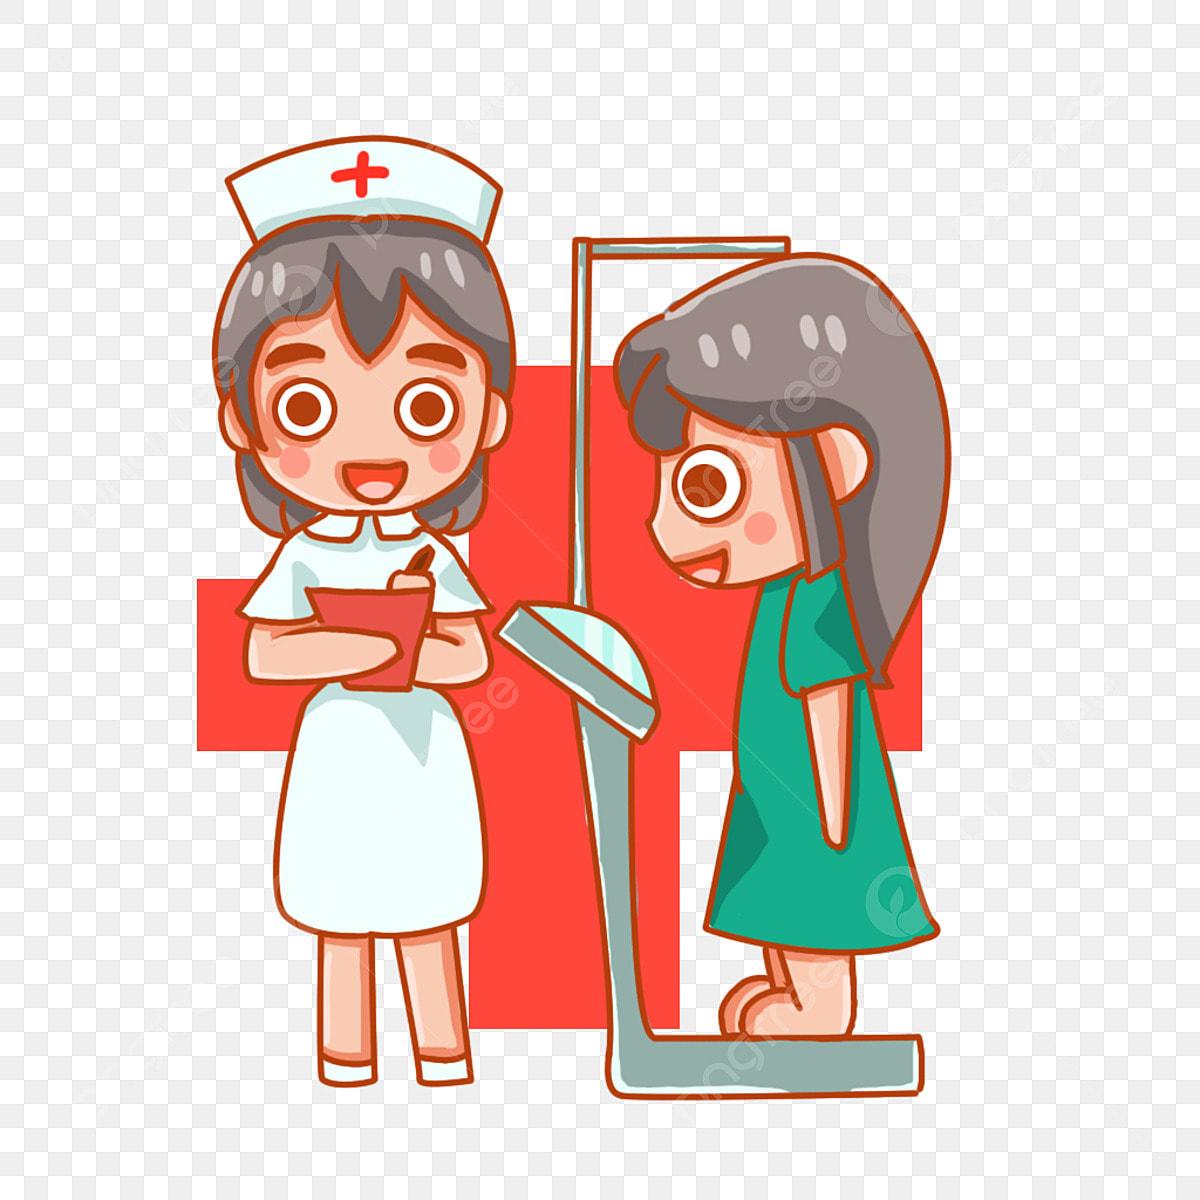 Nurse Clip Art, Nurse Humor, Psych - Nurse Clip Art , Free Transparent  Clipart - ClipartKey